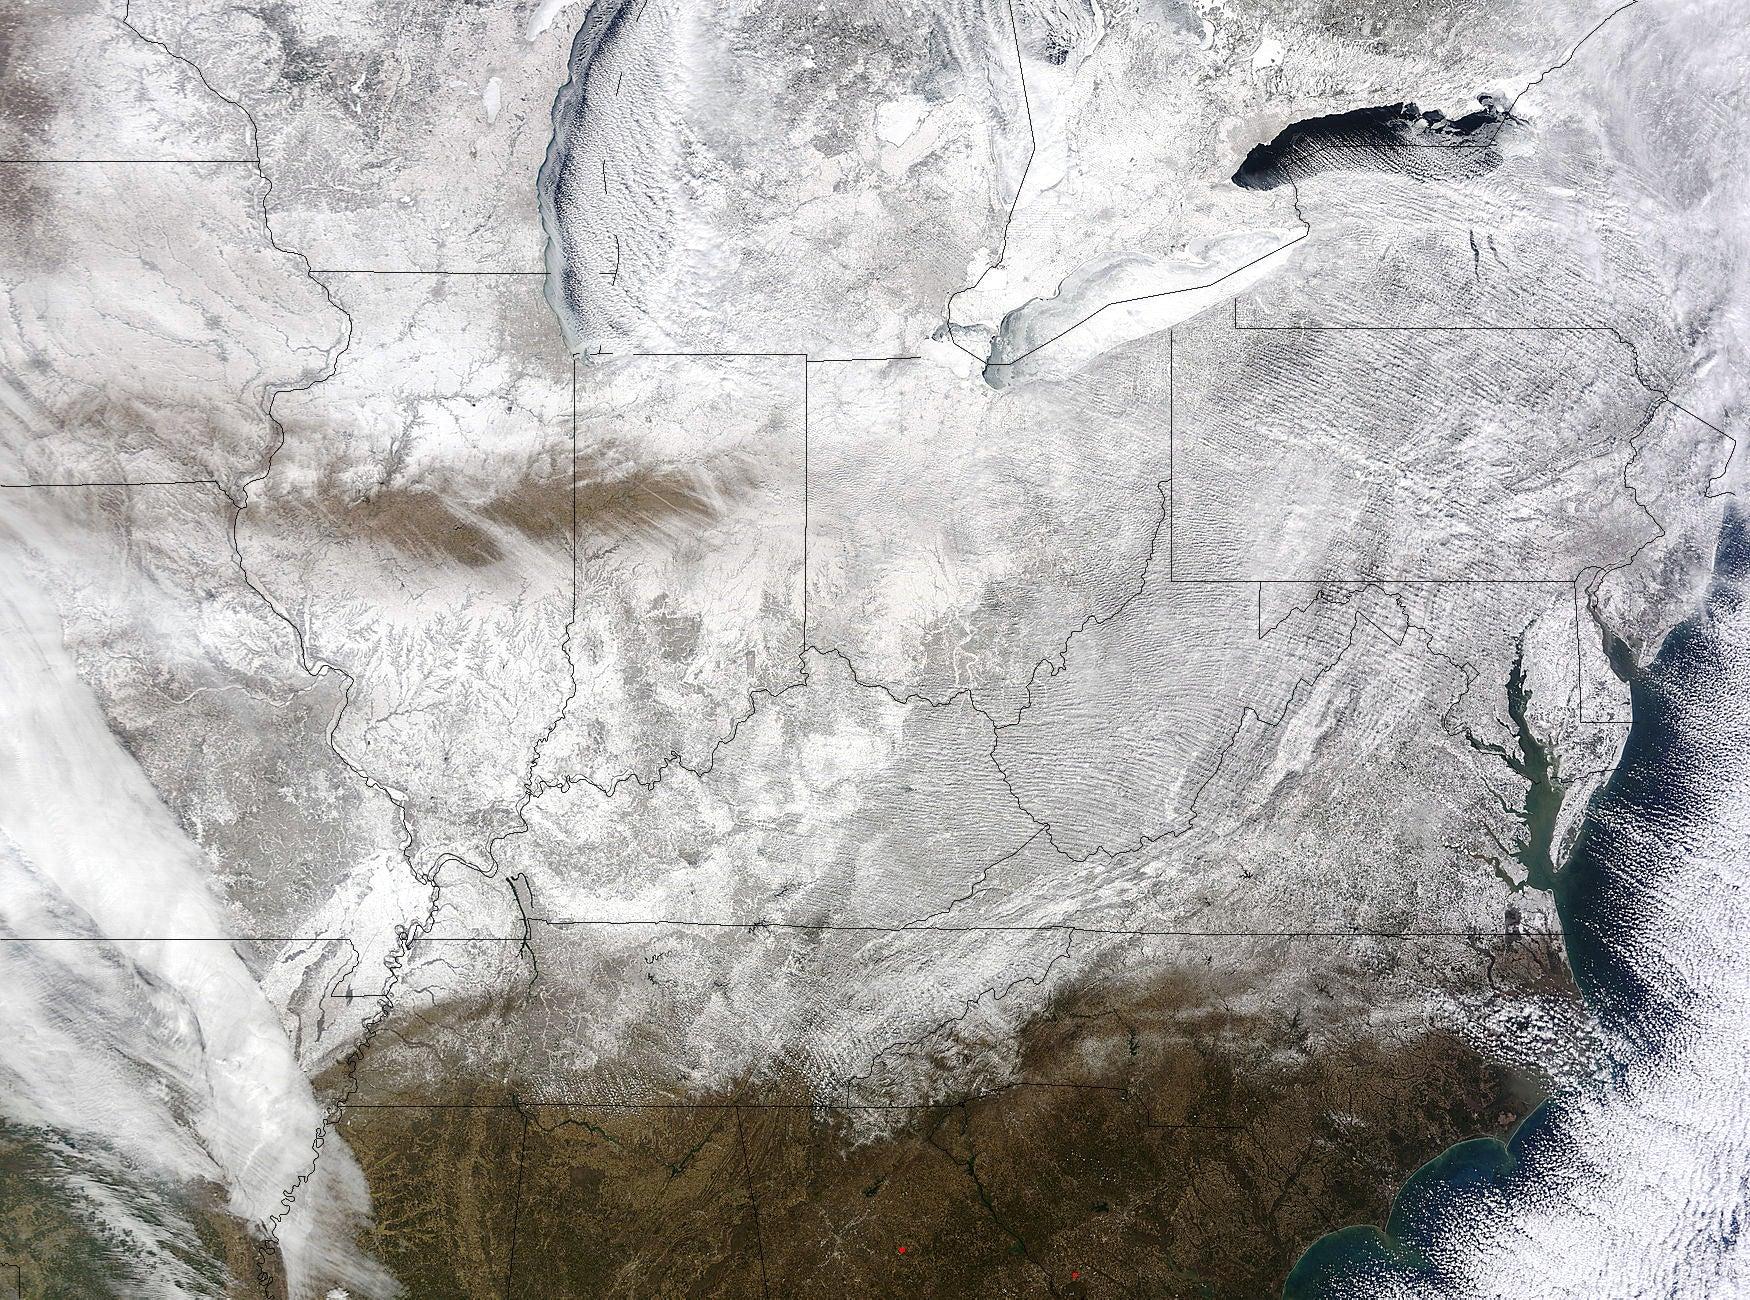 NASA satellite image shows record-breaking frozen Eastern US